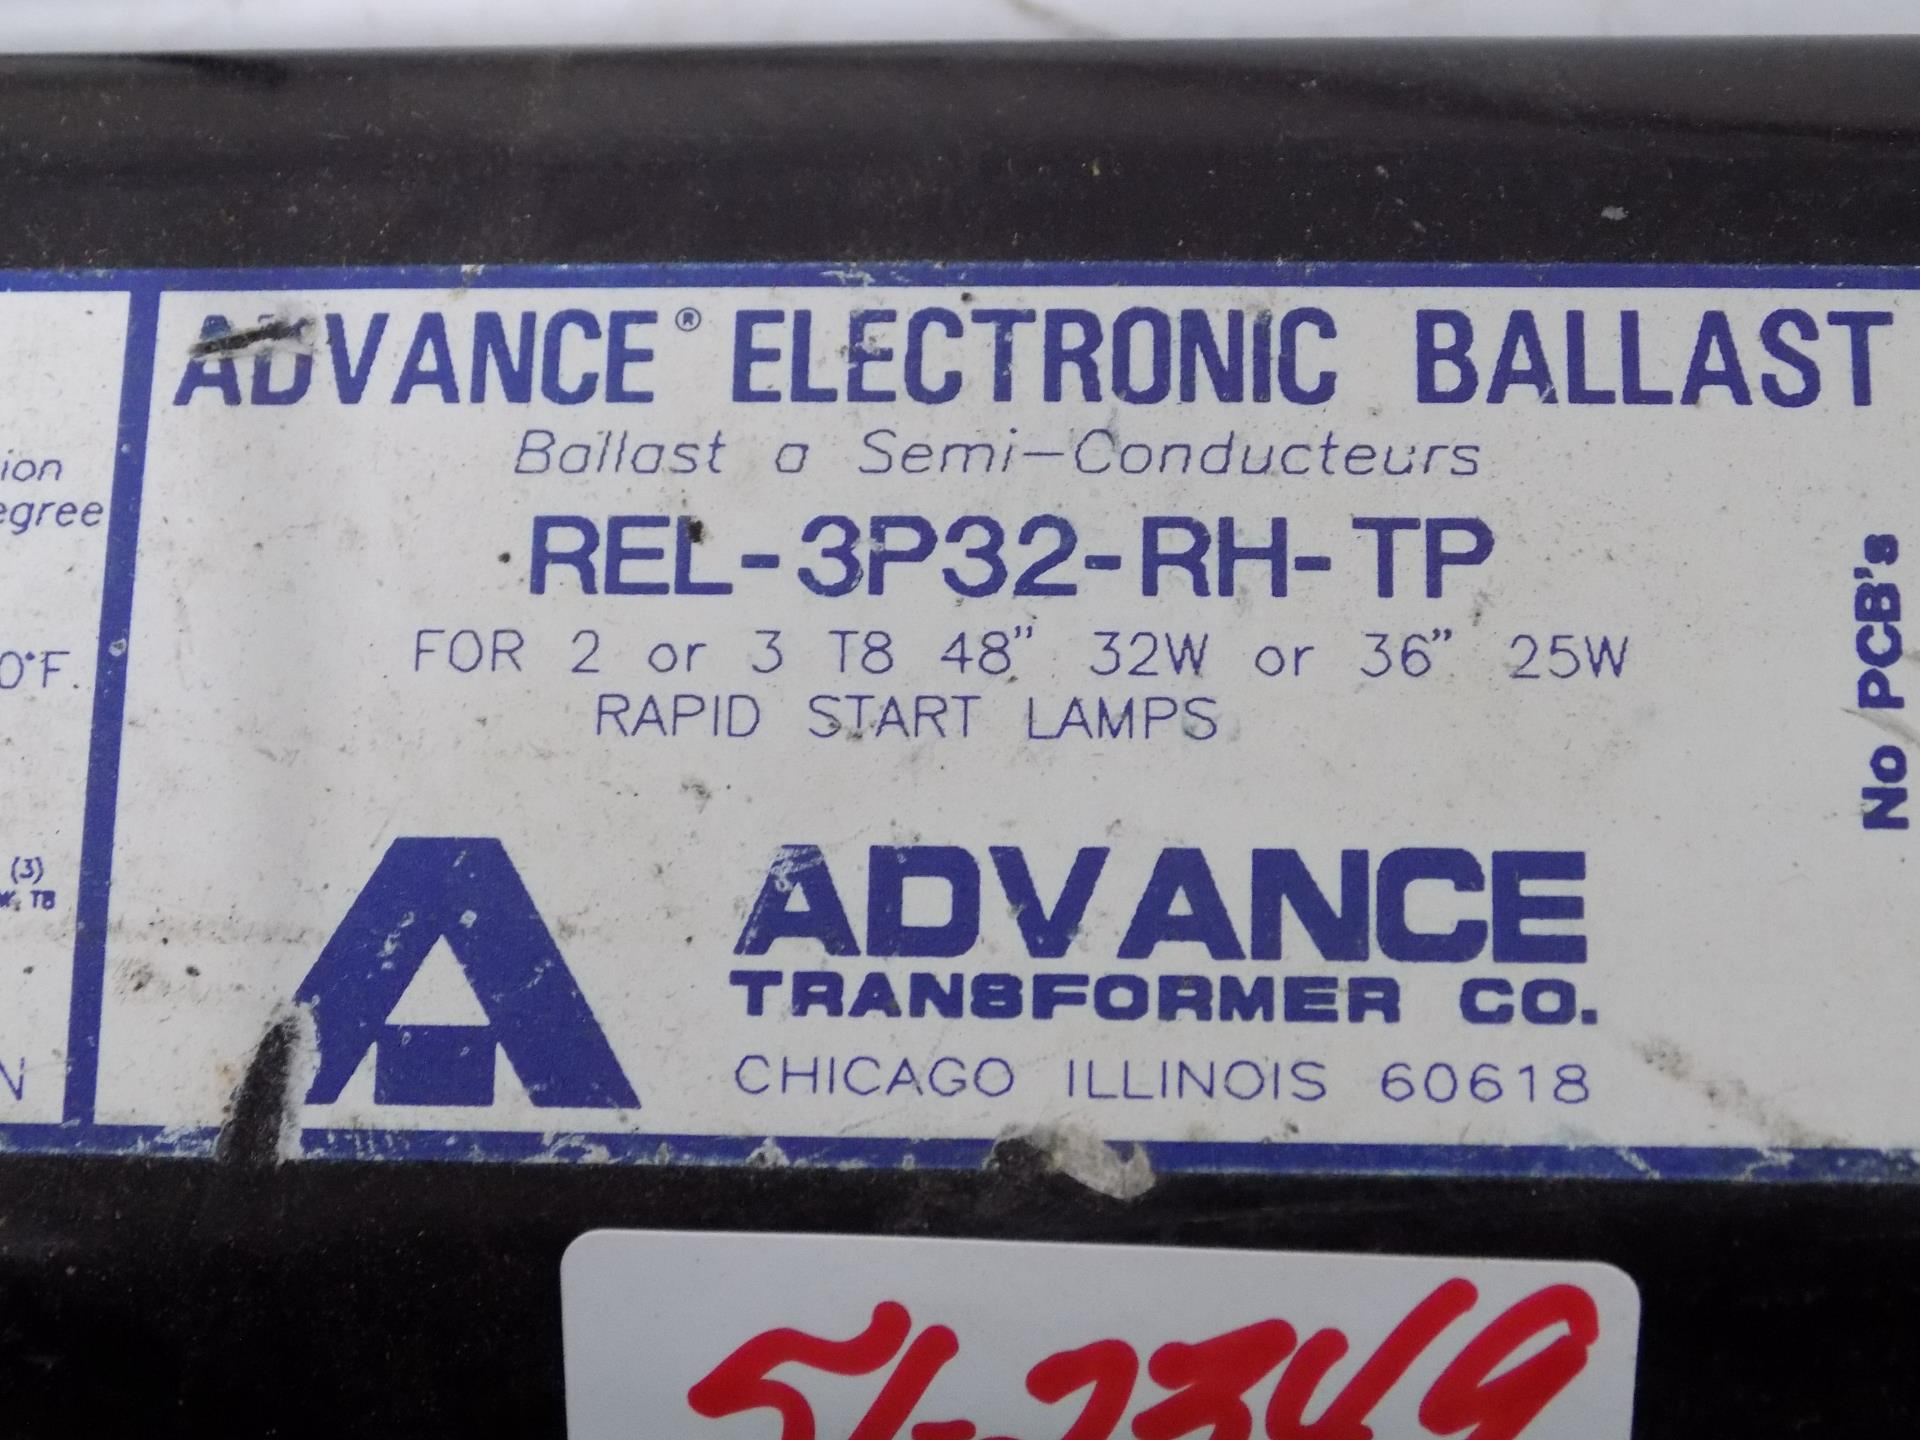 Advance Standard REL-3P32-LW-RH-TP 120V NIB FREE SHIPPING